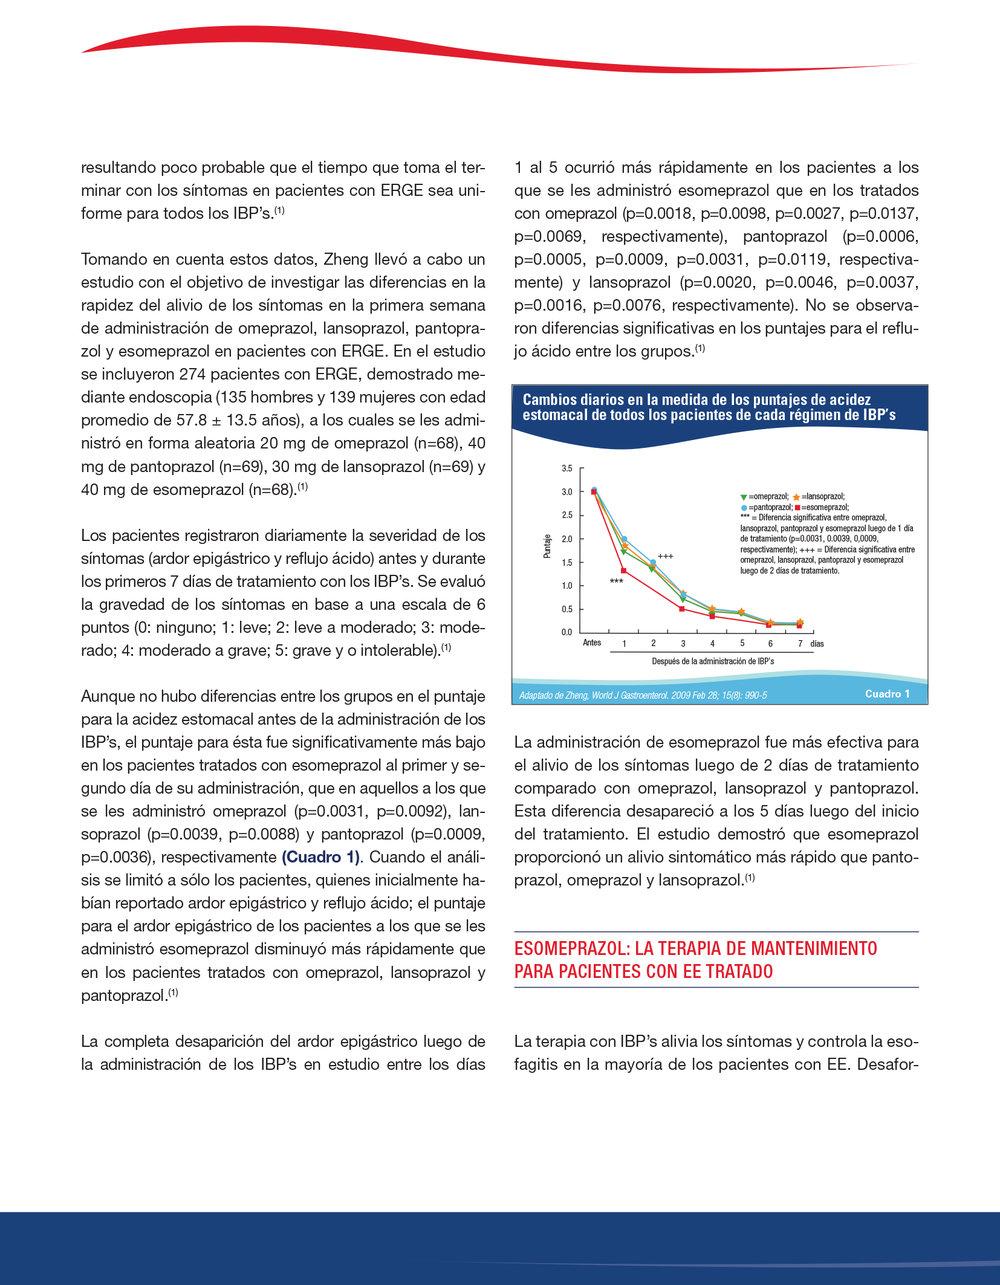 Esonex_Noticias2.jpg